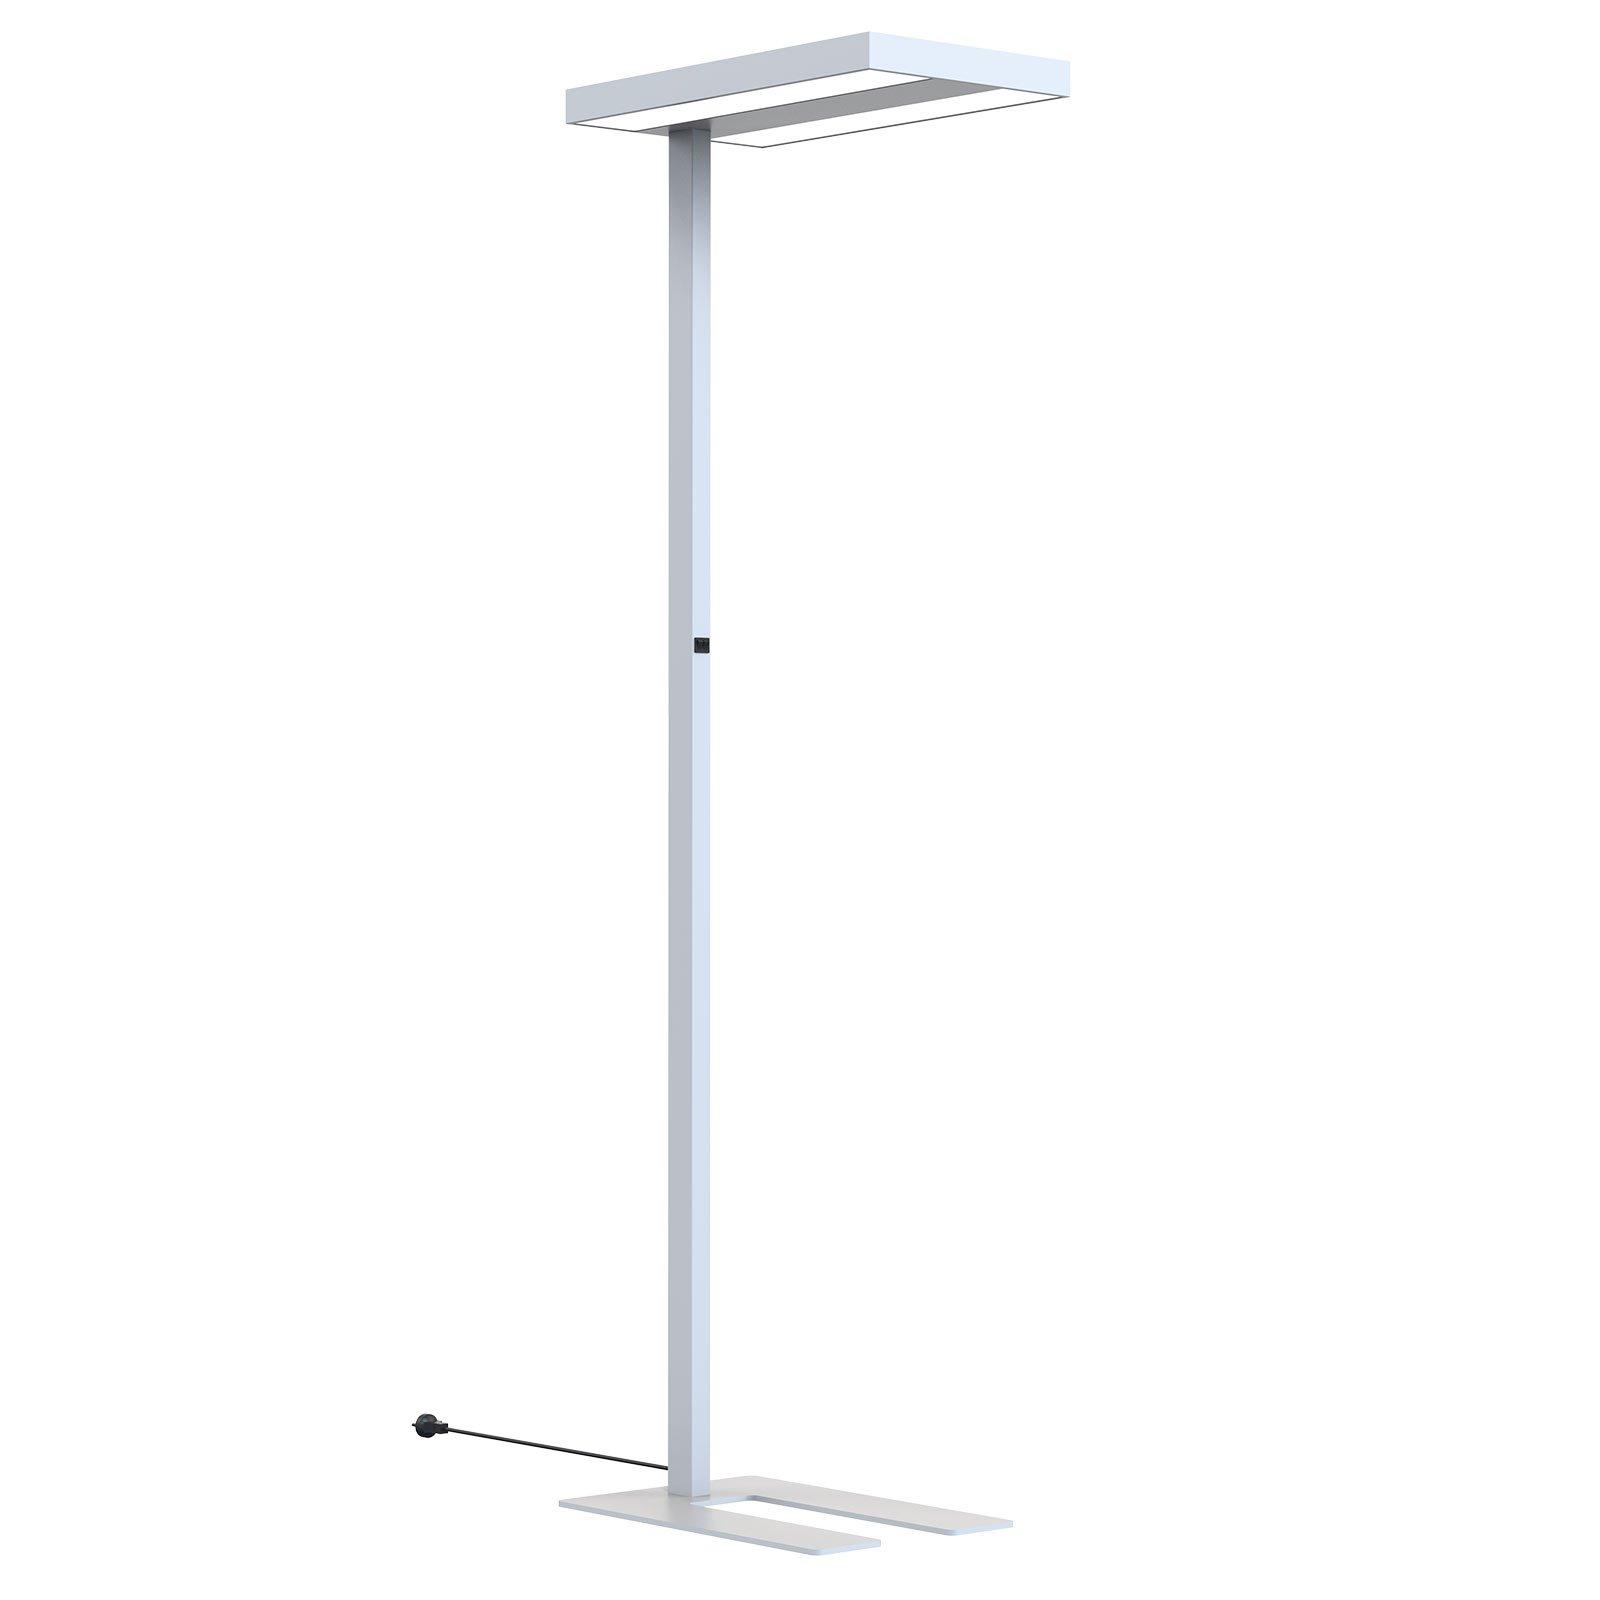 Arcchio Kalem gulvlampe til kontor, kantet, sølv